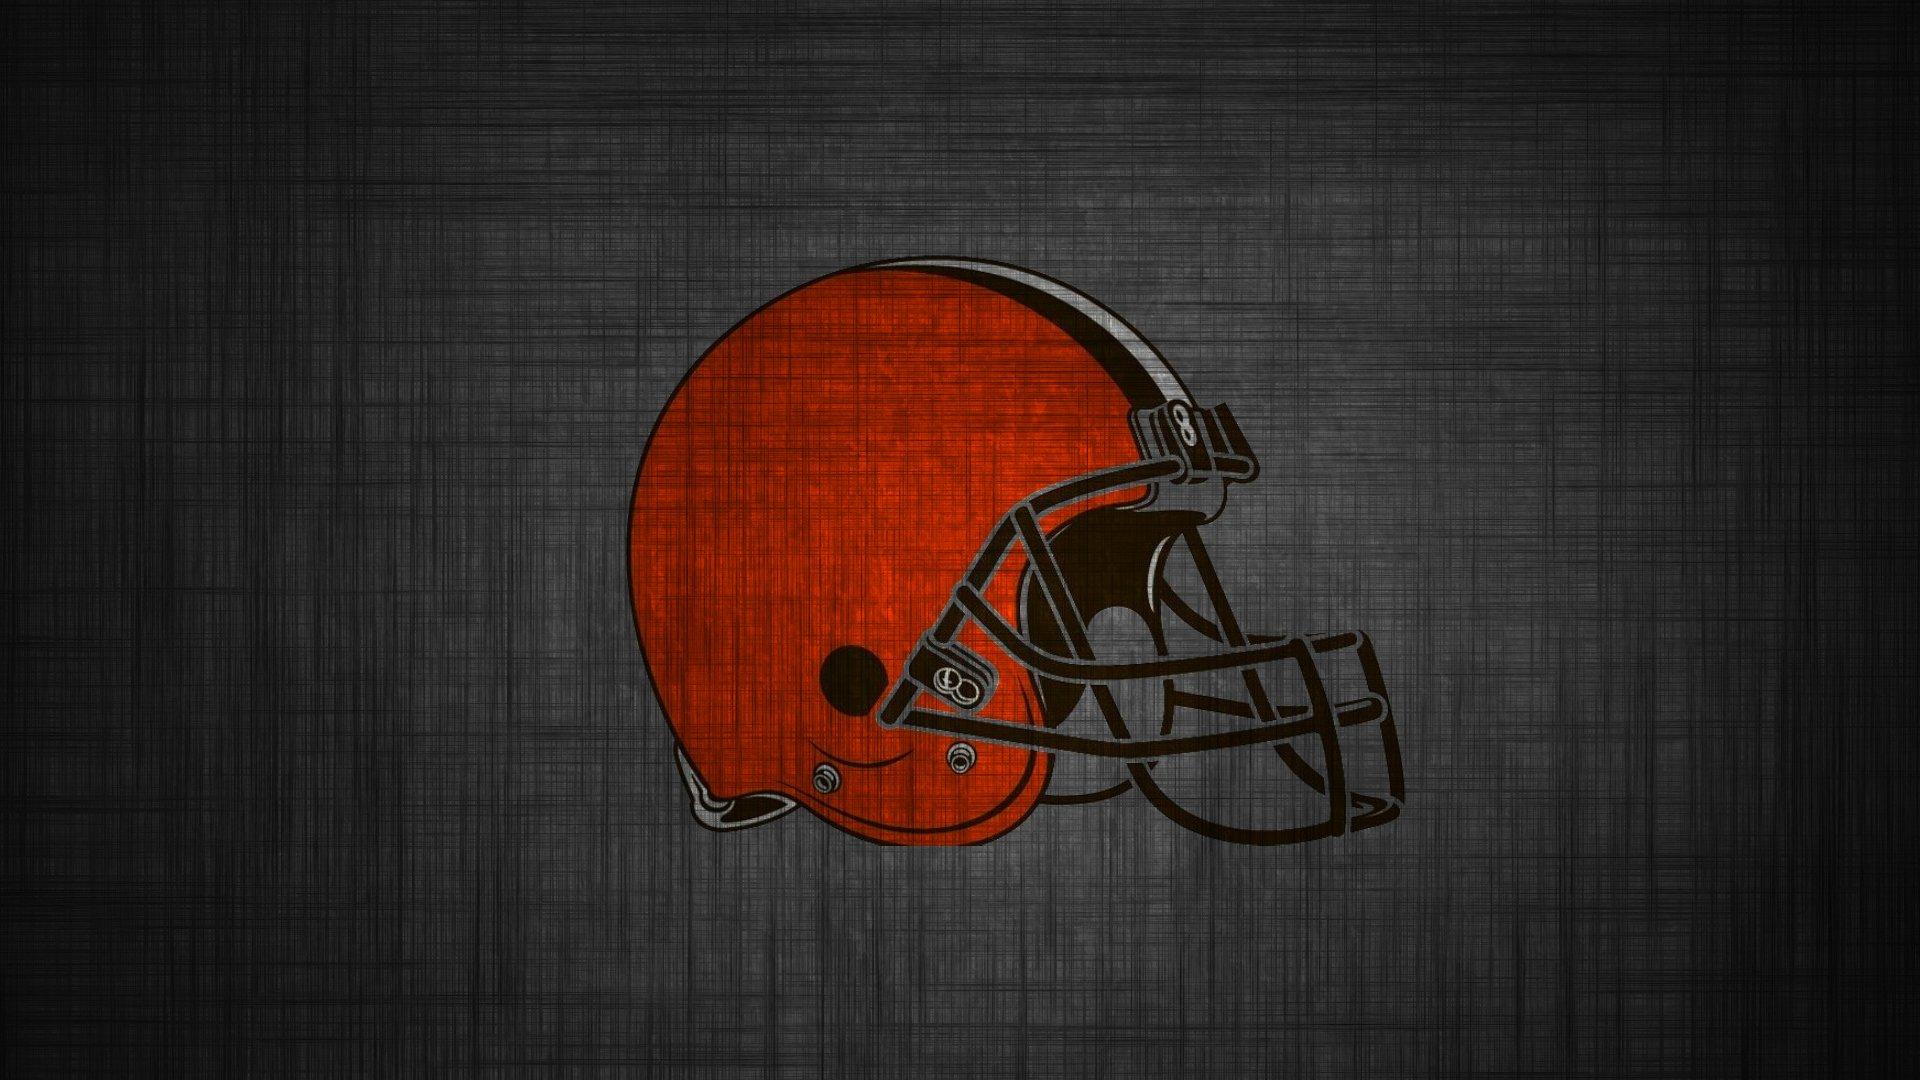 Chicago Bears Hd Wallpaper Free Dessktop Cleveland Browns Wallpapers Pixelstalk Net